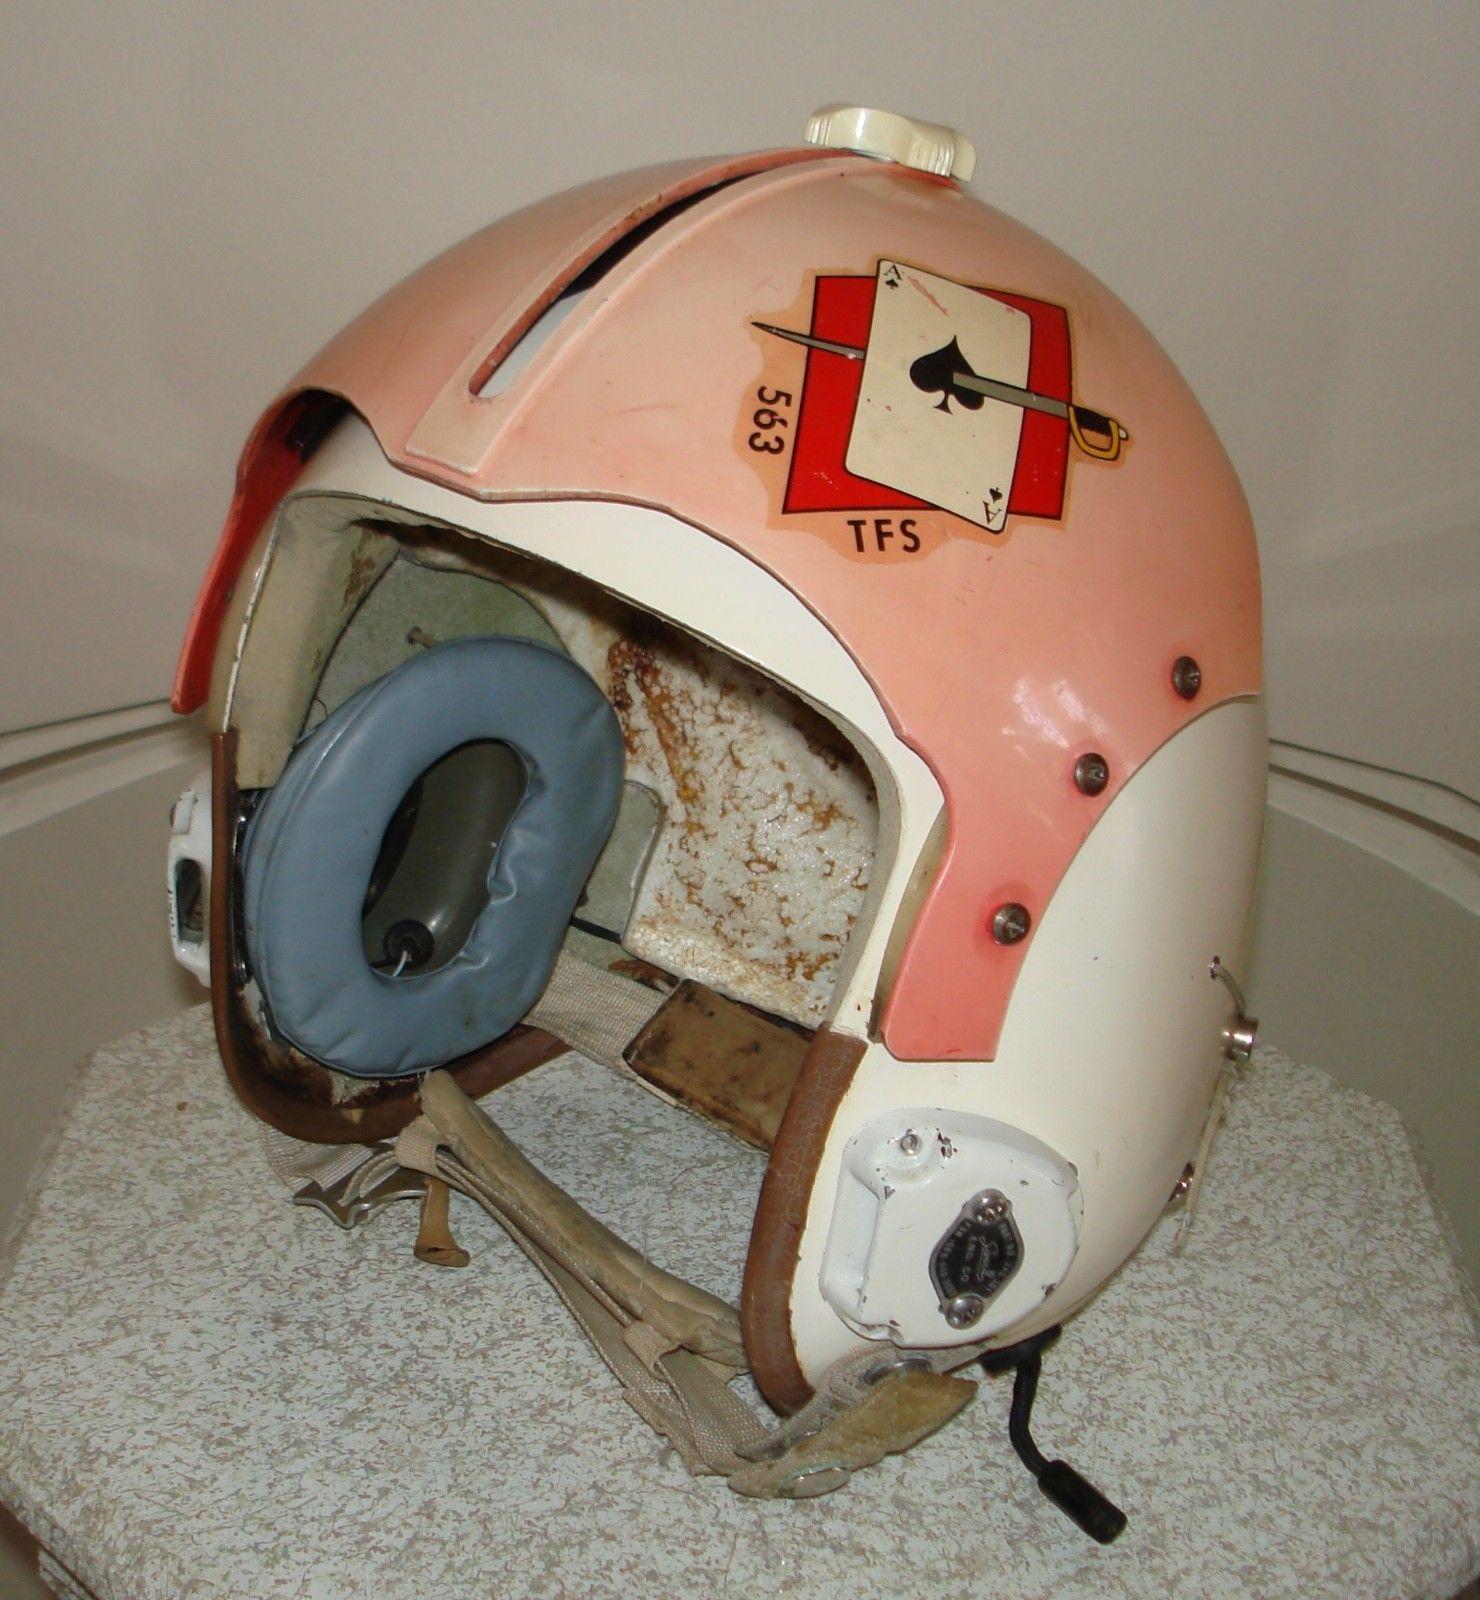 Flight helmet visor for HGU55/P, MBU12/P O2 mask